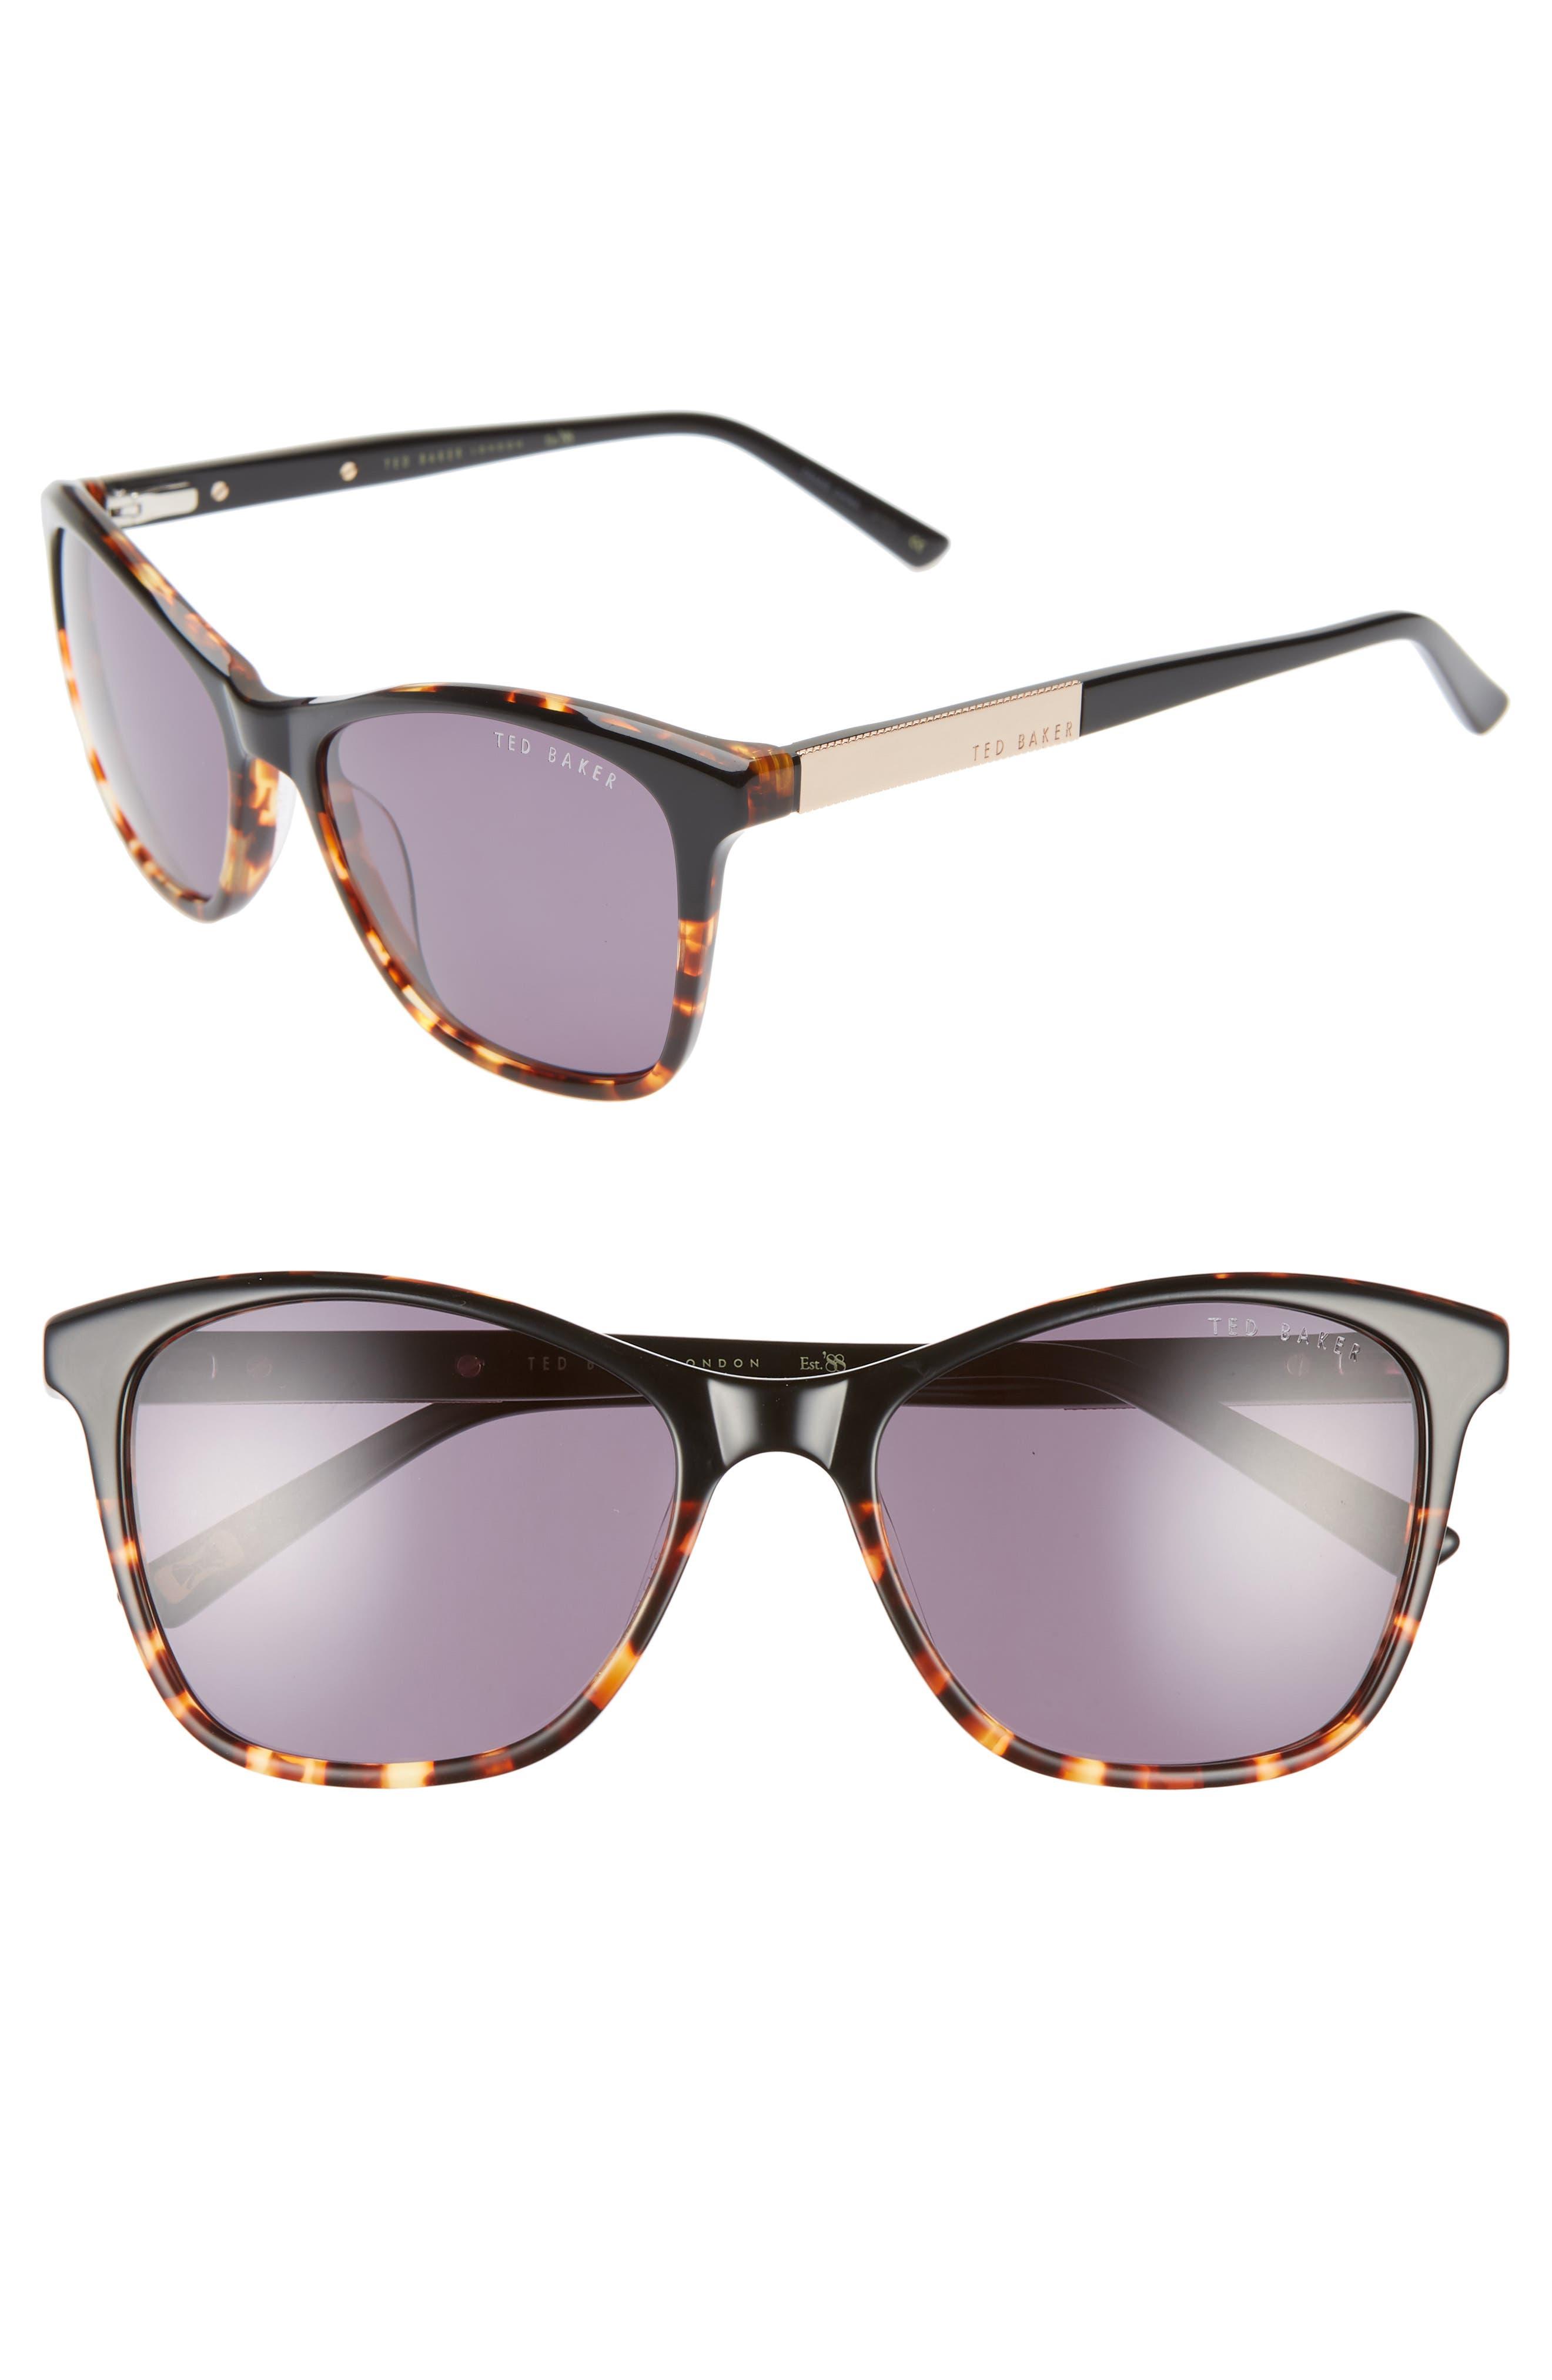 TED BAKER LONDON, 55mm Square Cat Eye Sunglasses, Main thumbnail 1, color, BLACK HAVANA/ GOLD/ PURPLE